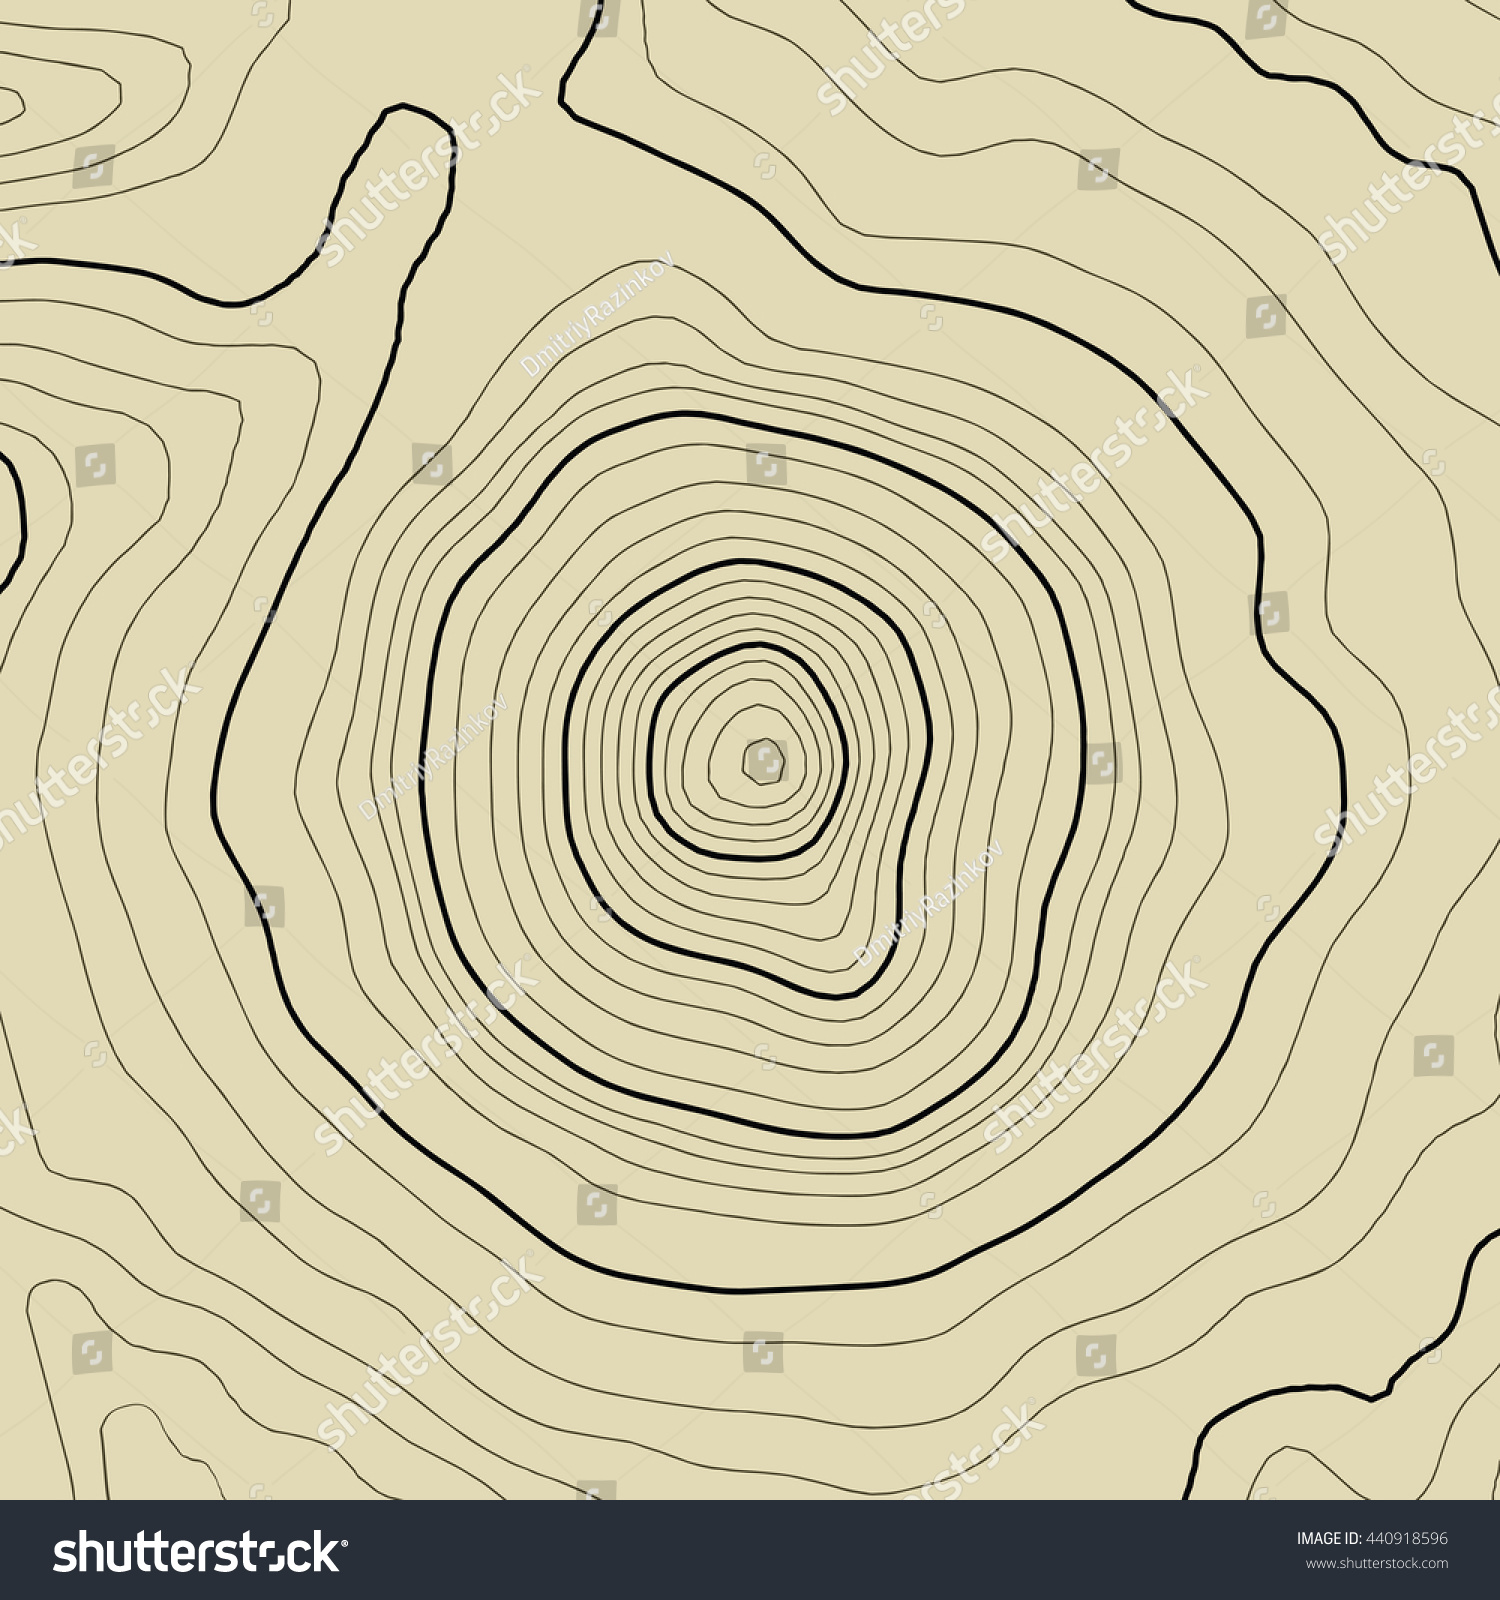 Topographic Map Vector Topography Lines Art Stock Vector